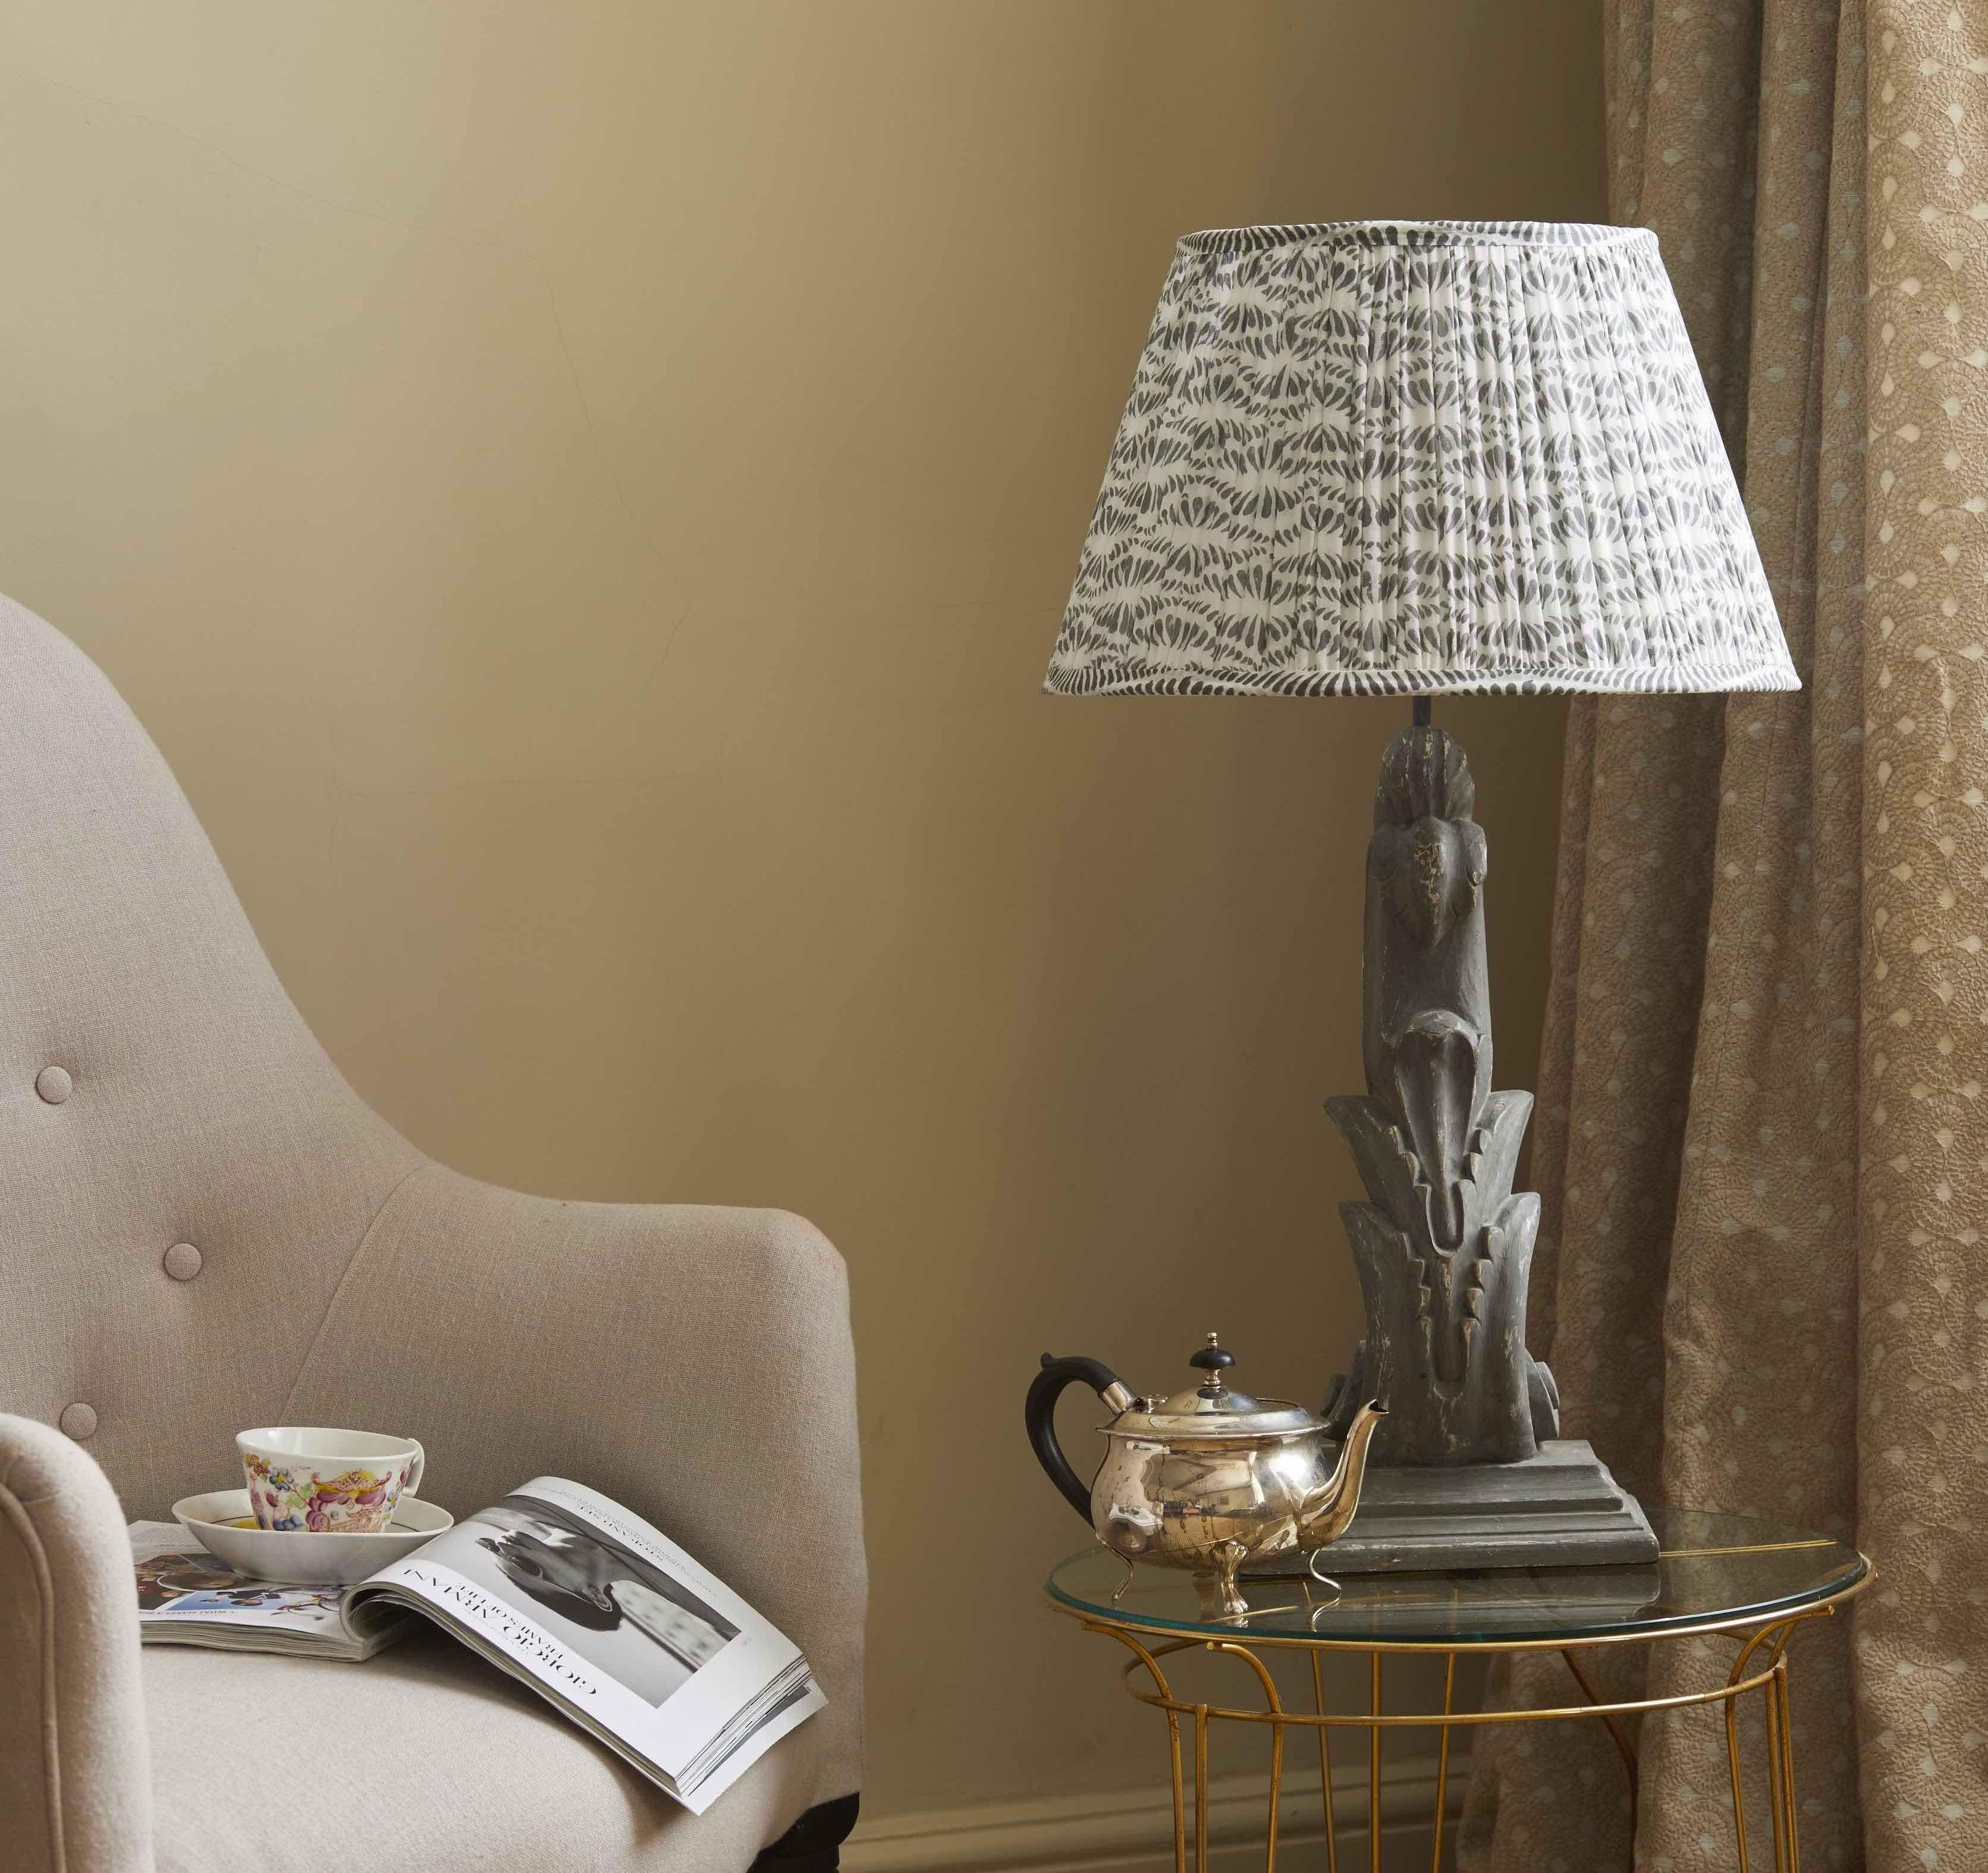 lamp shades, rugs, throws, cushions, interiors